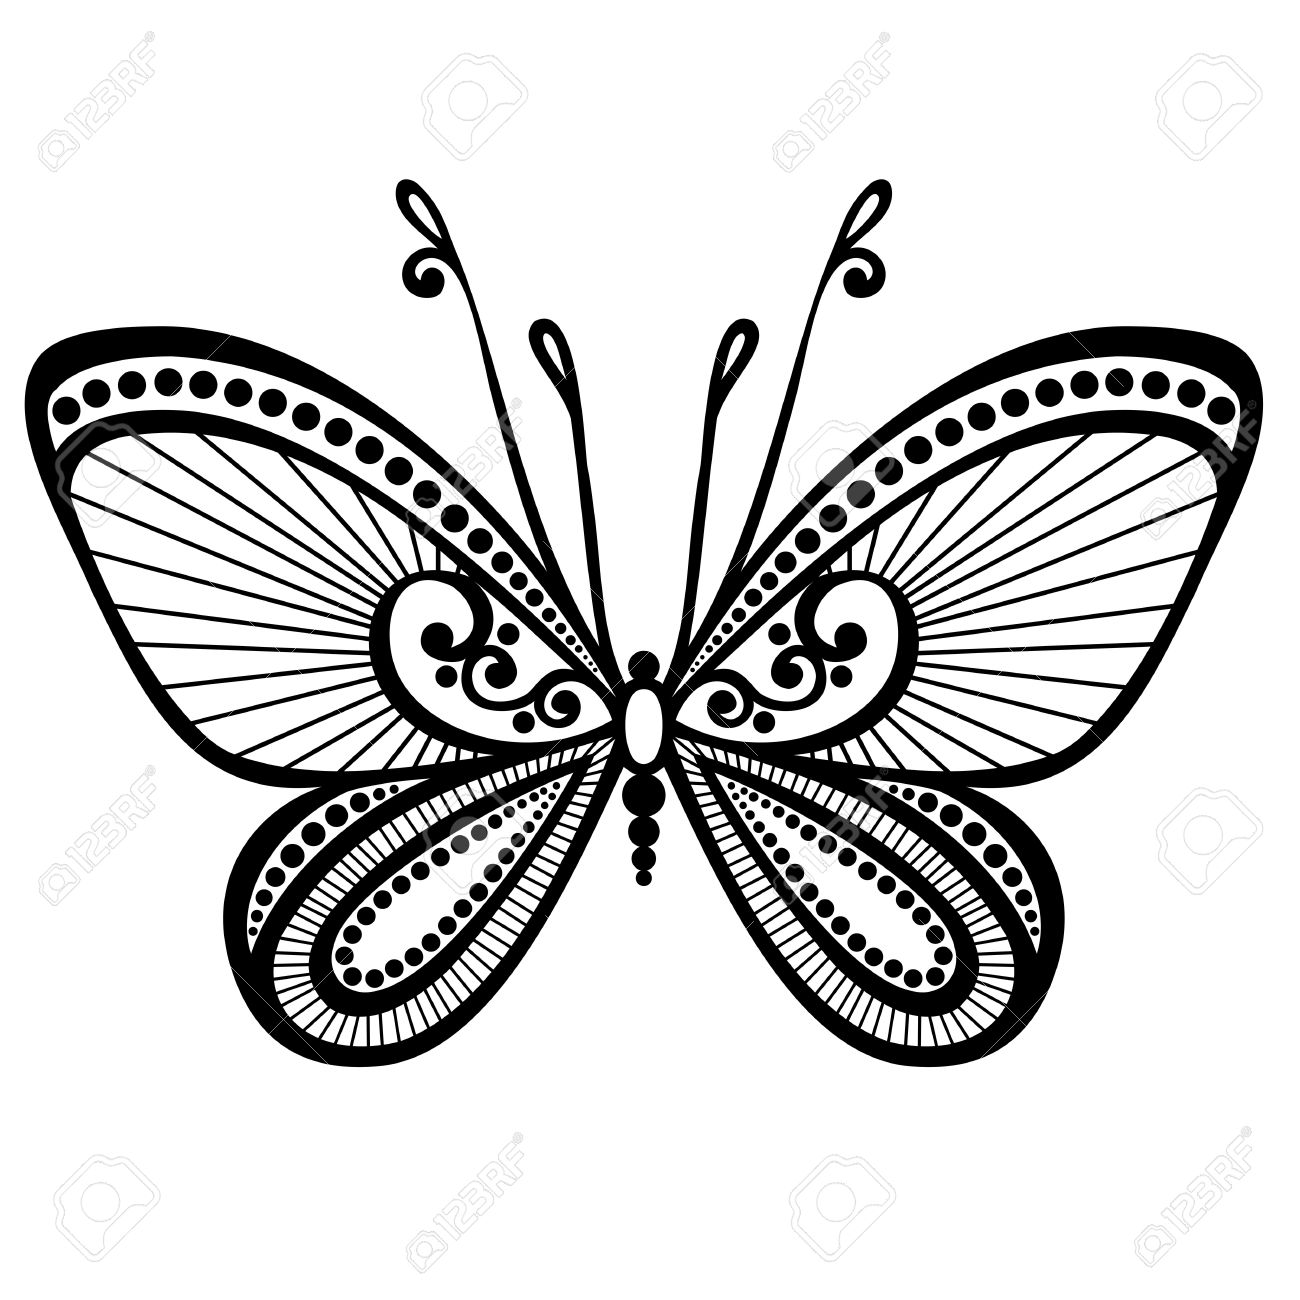 butterfly drawing designs wwwpixsharkcom images